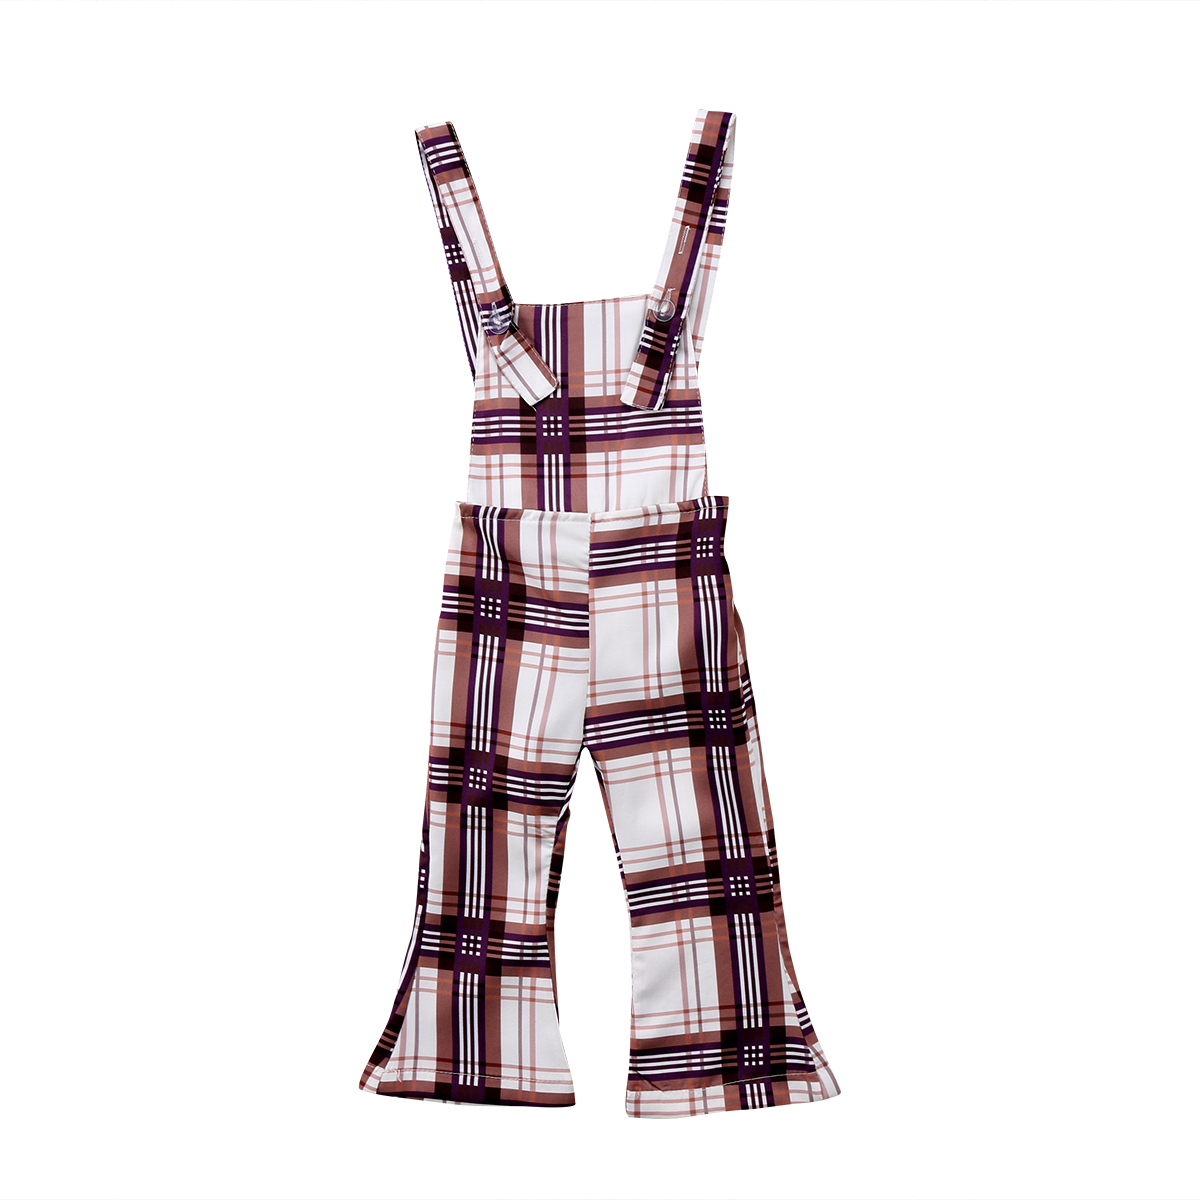 2018 Mädchen Lange Bib Hosen Glocke Böden Strampler Plaid Overalls Overall Outfits Backless Sommer Strampler